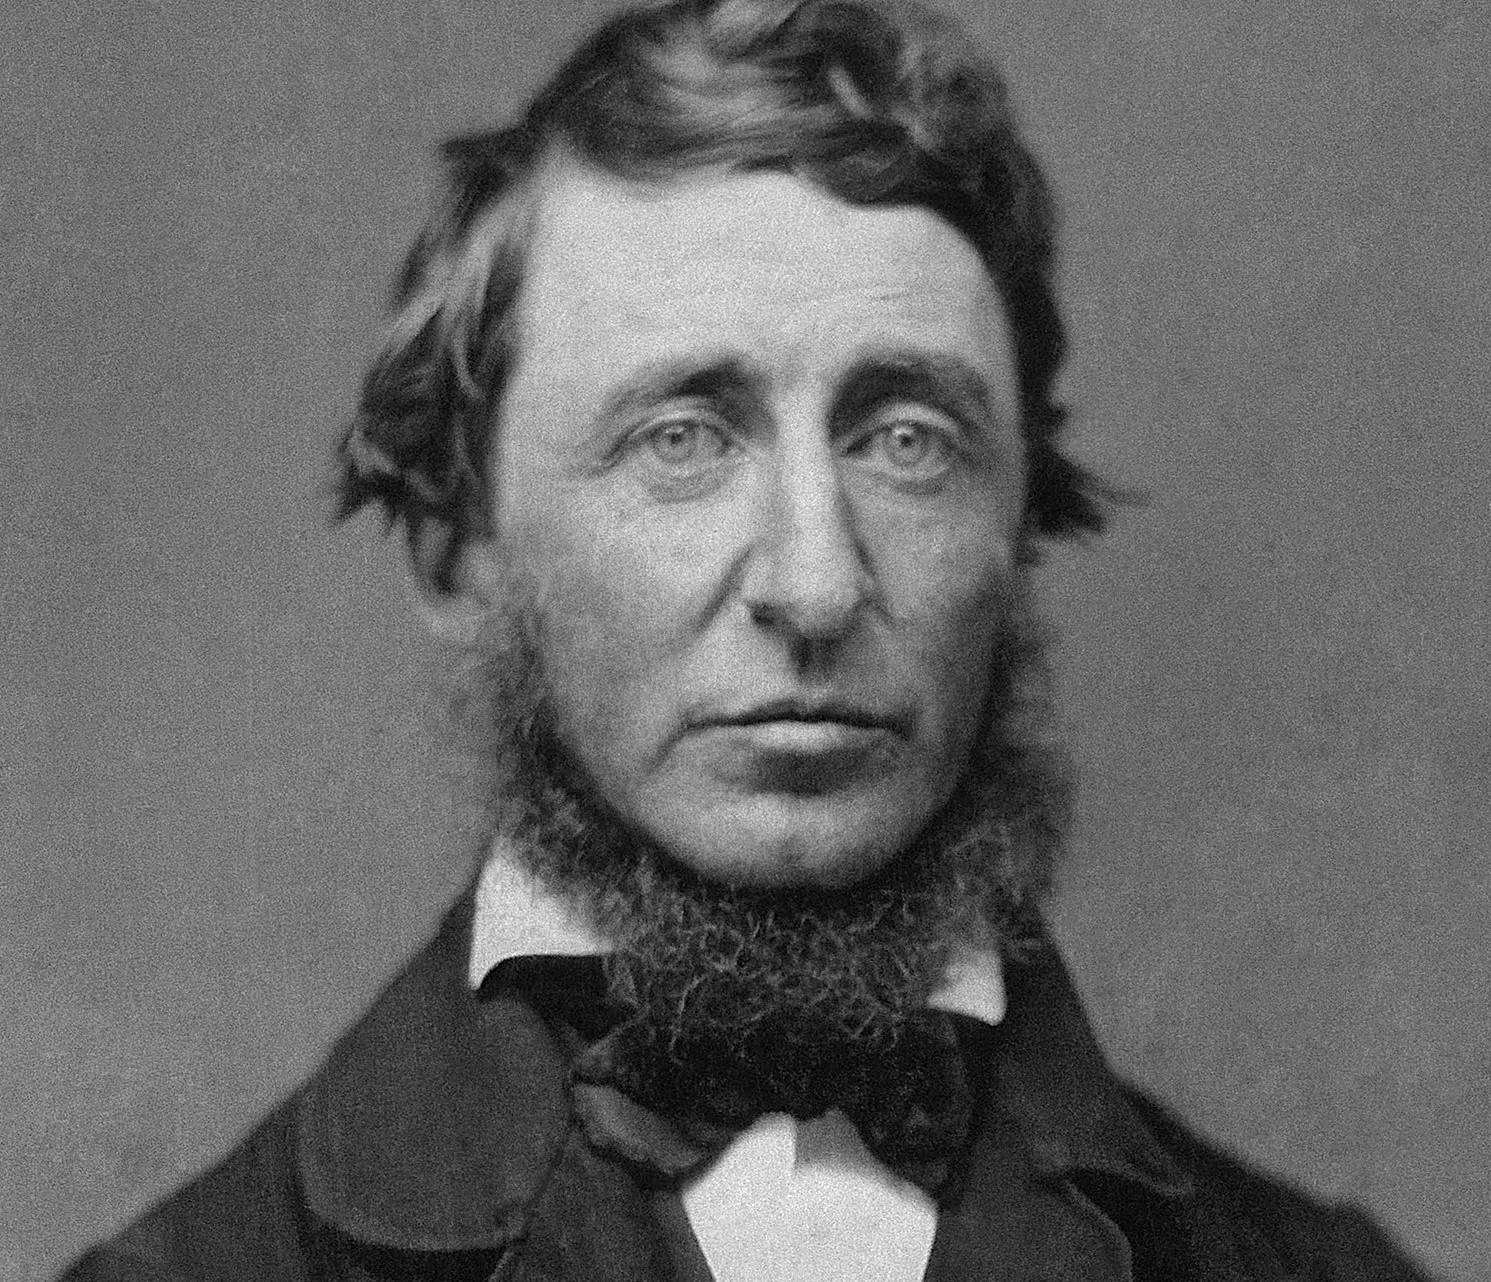 Henry David Thoreau Foto: Domini Públic